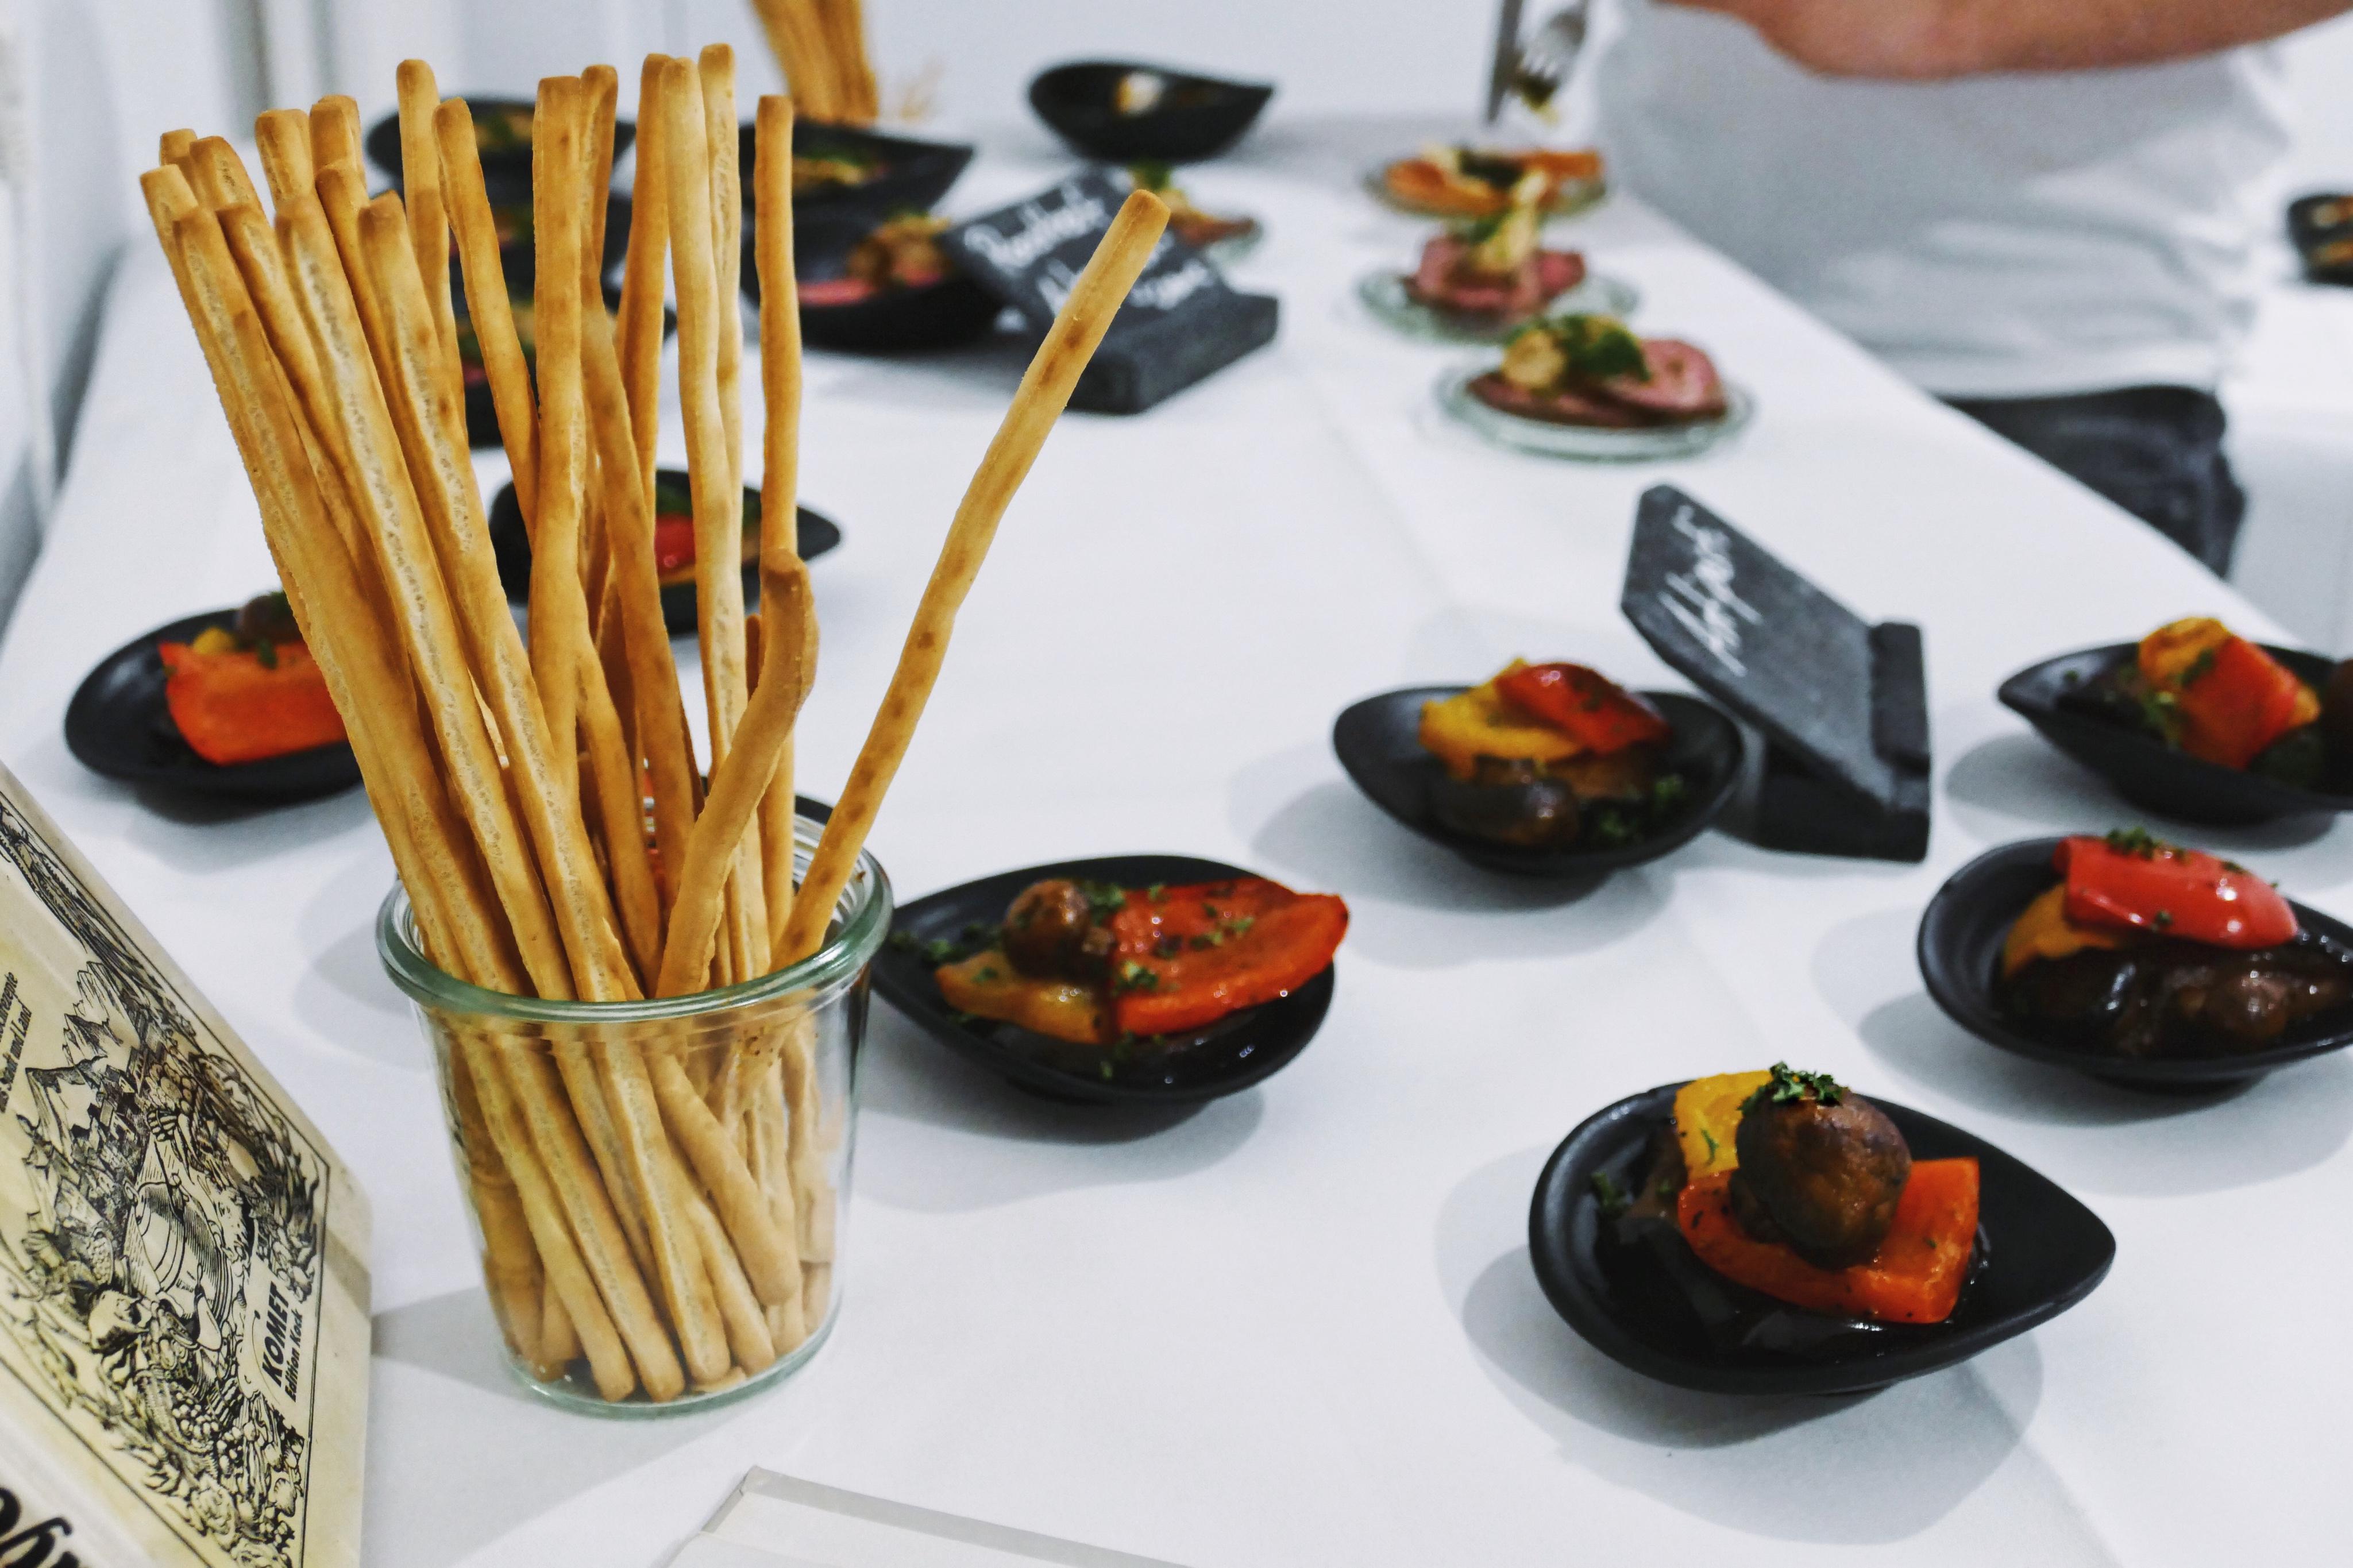 Kochen, Nudeln, Hotel Service, Kulinarik, HOtel Luxus vier Sterne kochen